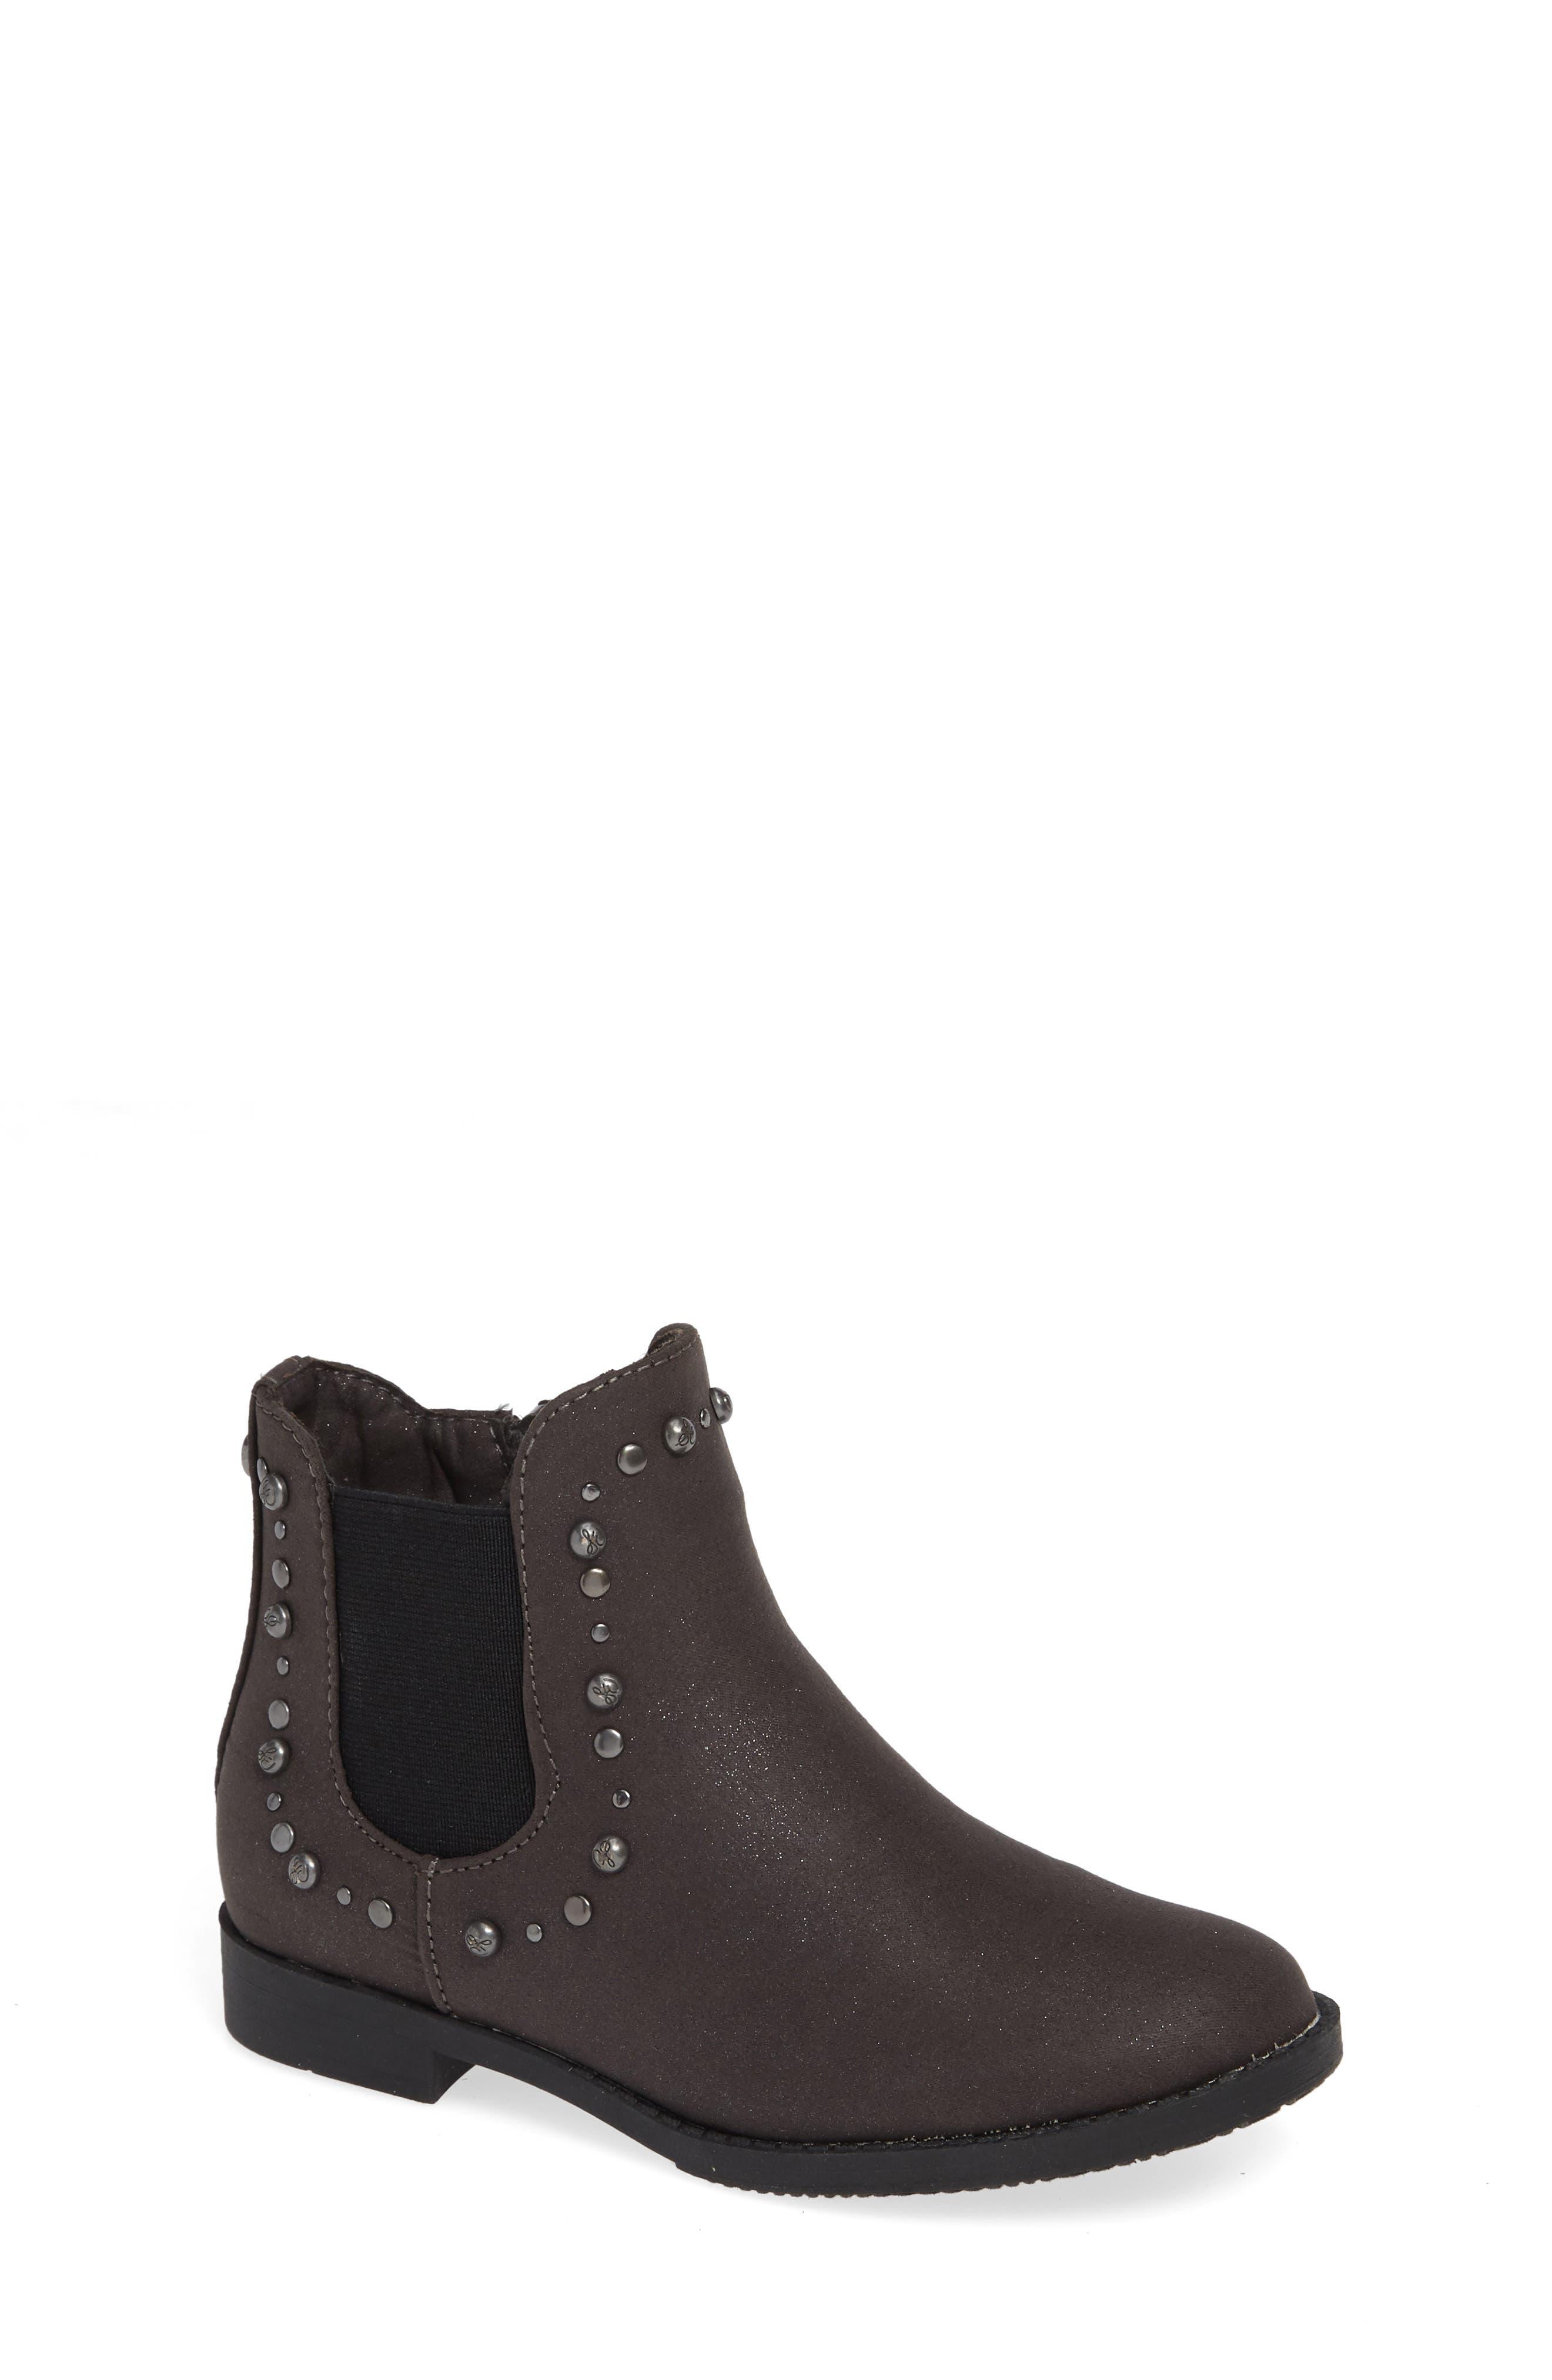 SAM EDELMAN Kendall Chelsea Boot, Main, color, 040